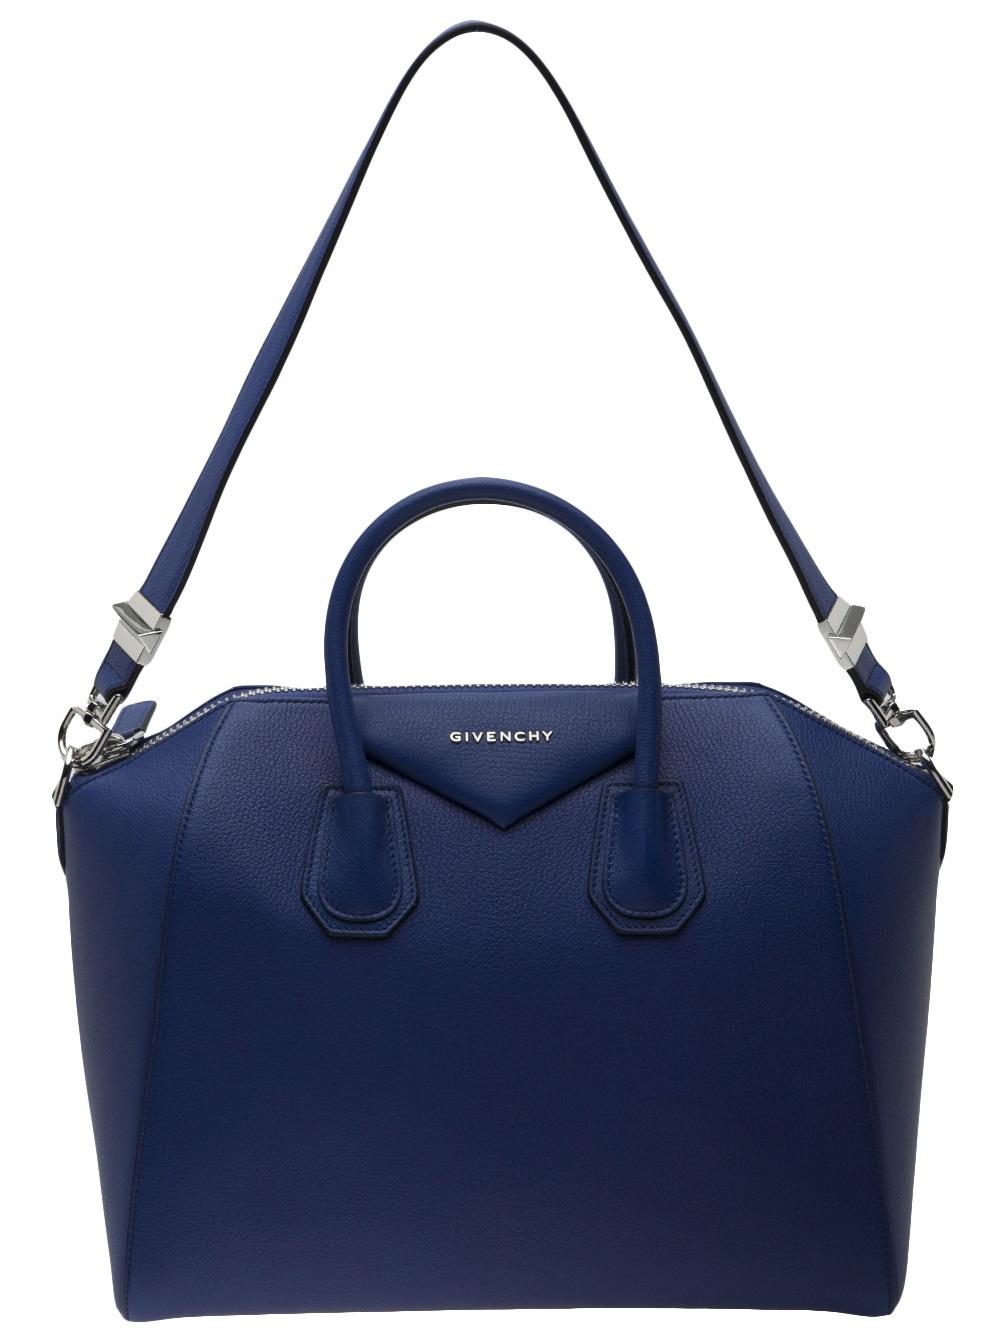 lyst givenchy antigona medium bag in blue. Black Bedroom Furniture Sets. Home Design Ideas